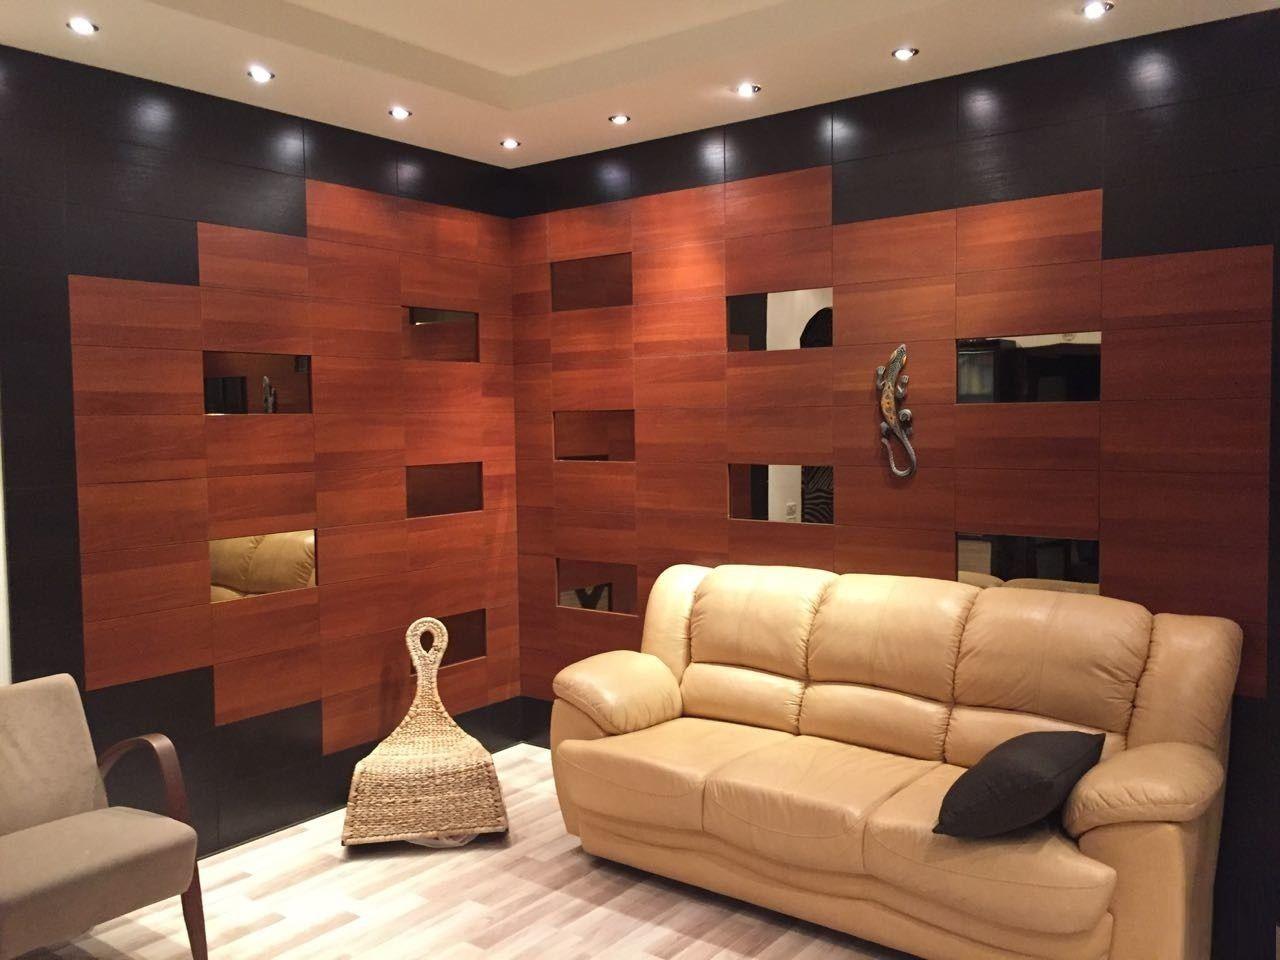 Дизайн квартир в ростове-на-дону